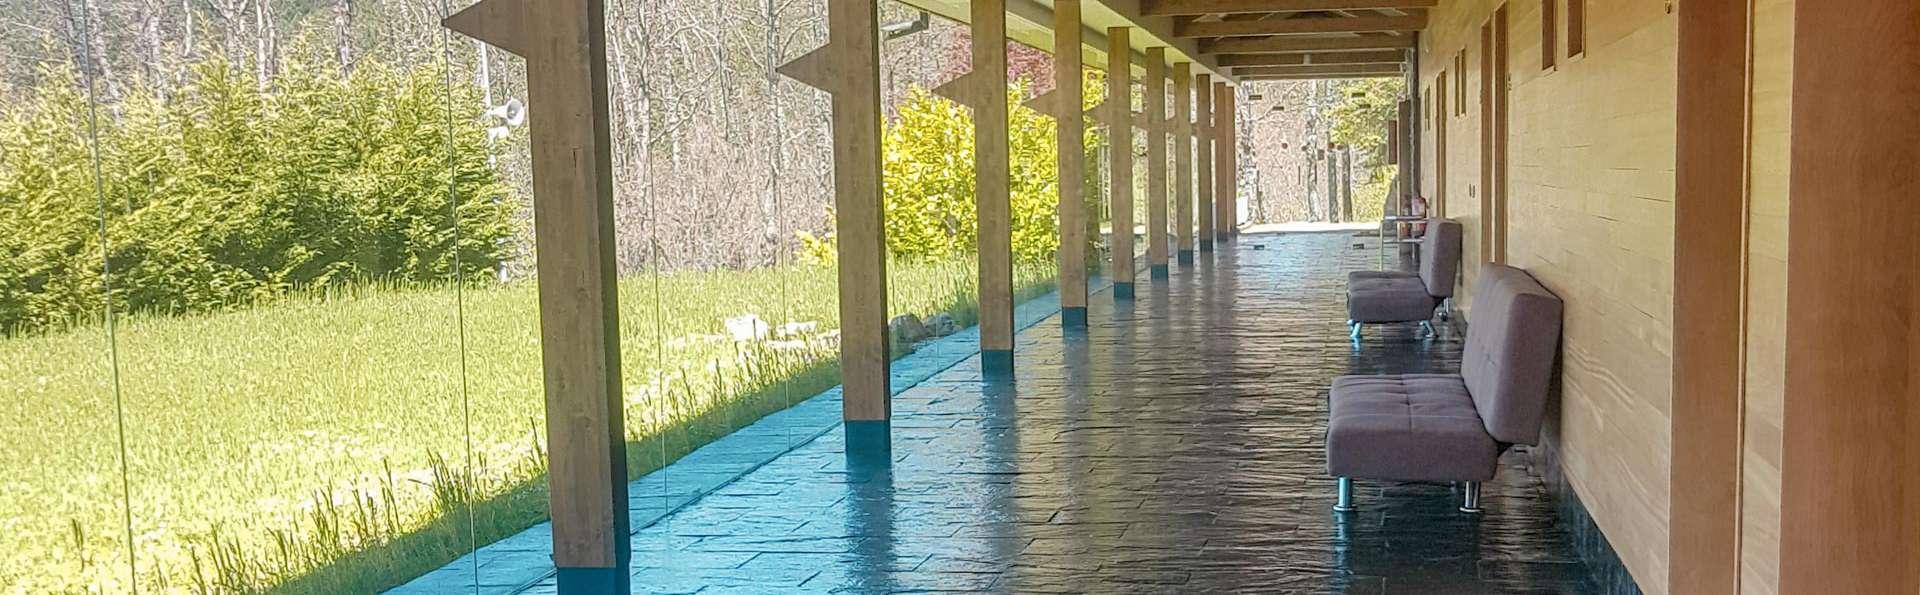 Hostel Grizzly Resort El Oso Pardo - EDIT_TERRACE_01.jpg